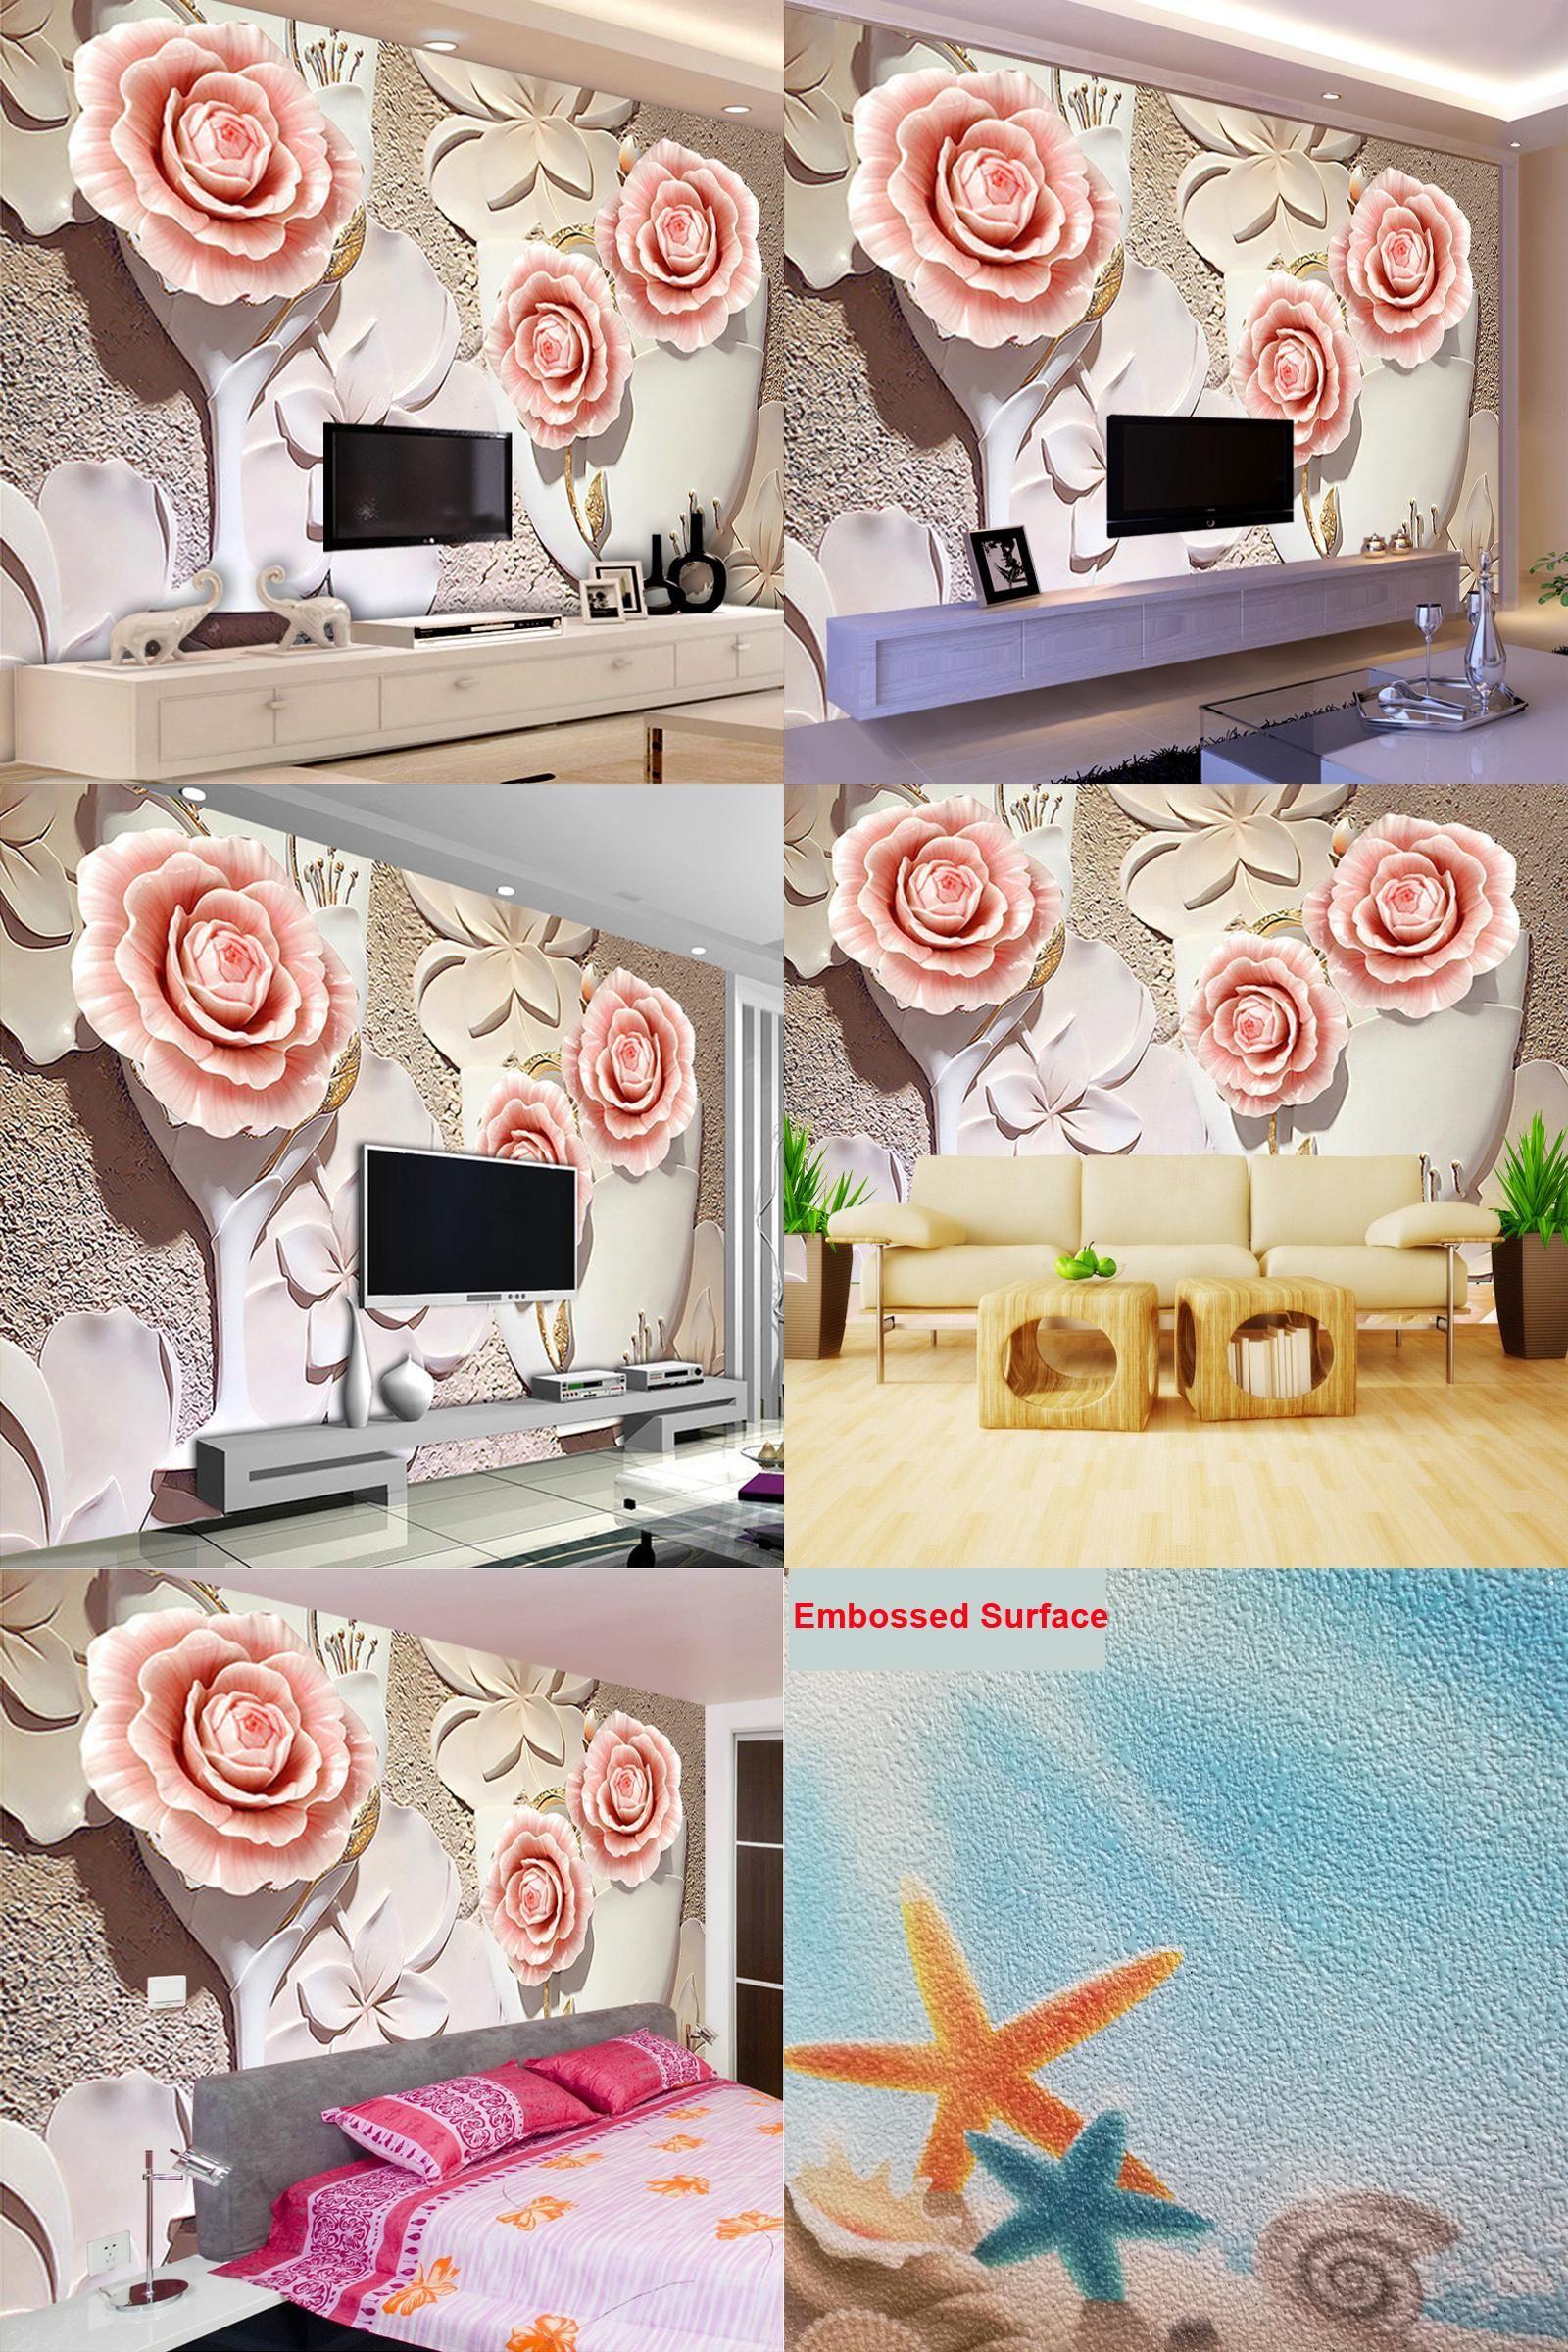 Visit To Buy Custom Photo Wallpaper 3D Embossed Flower Wall